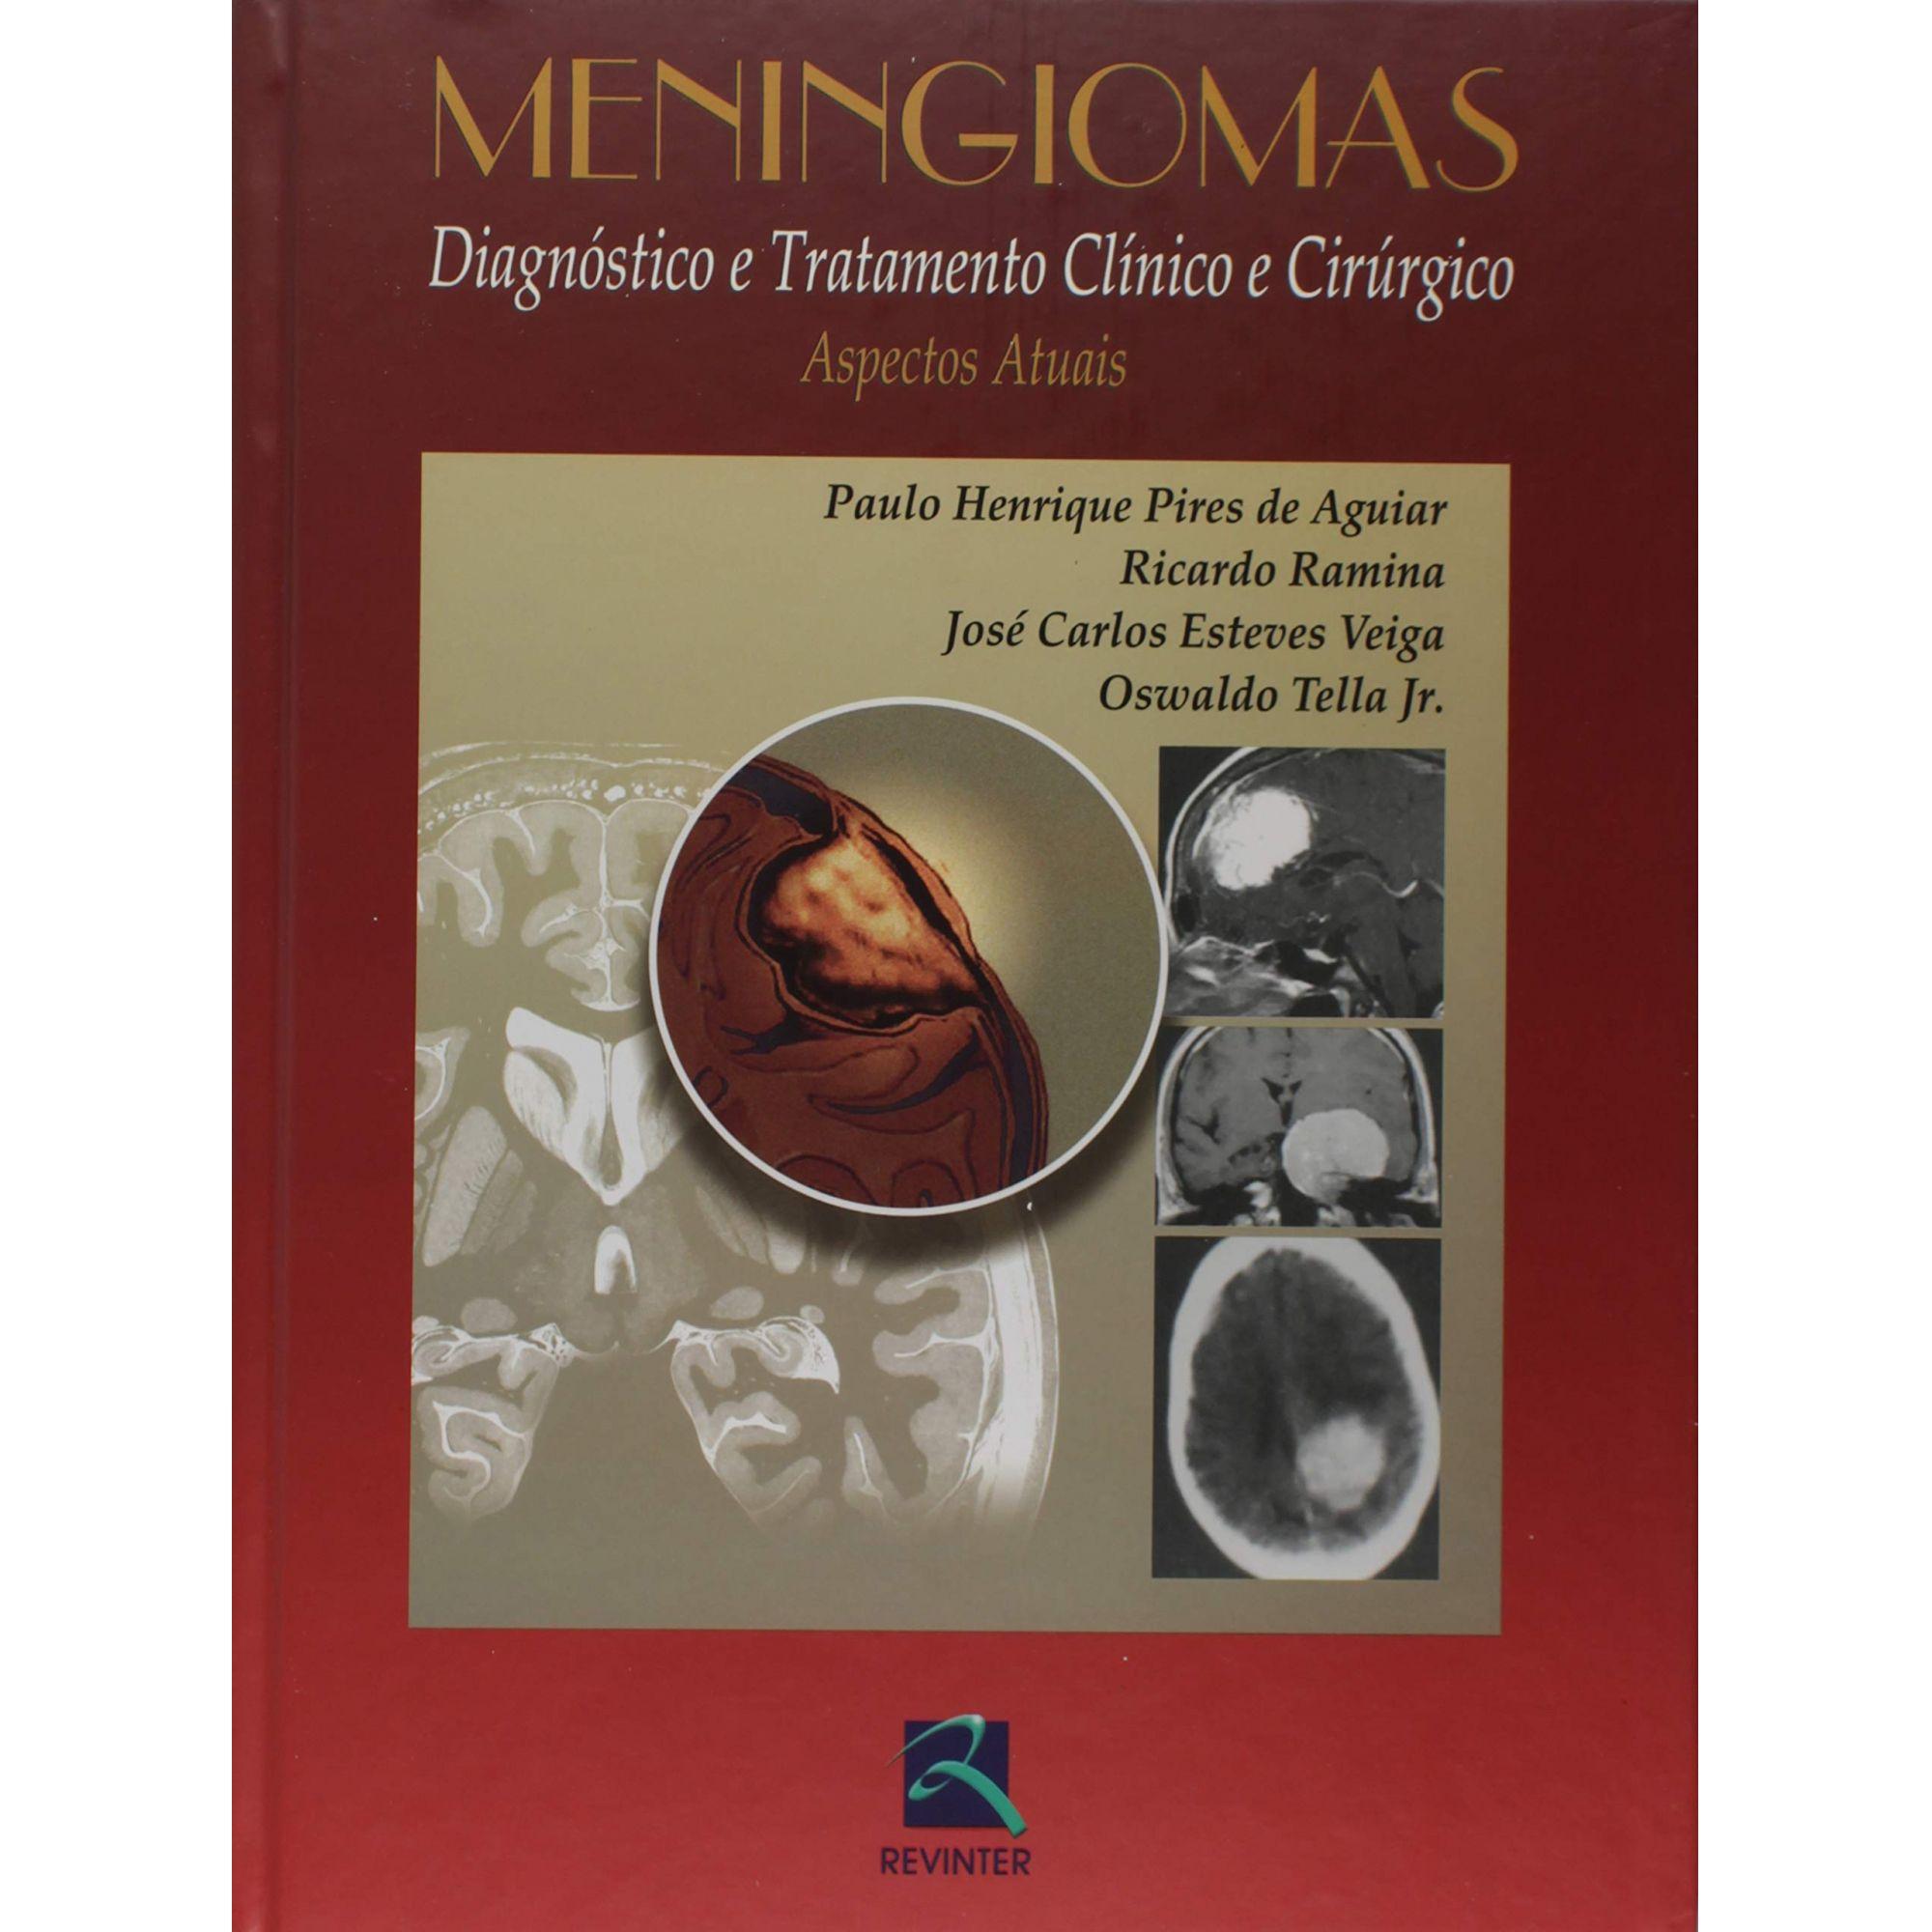 Livro Meningiomas  - LIVRARIA ODONTOMEDI